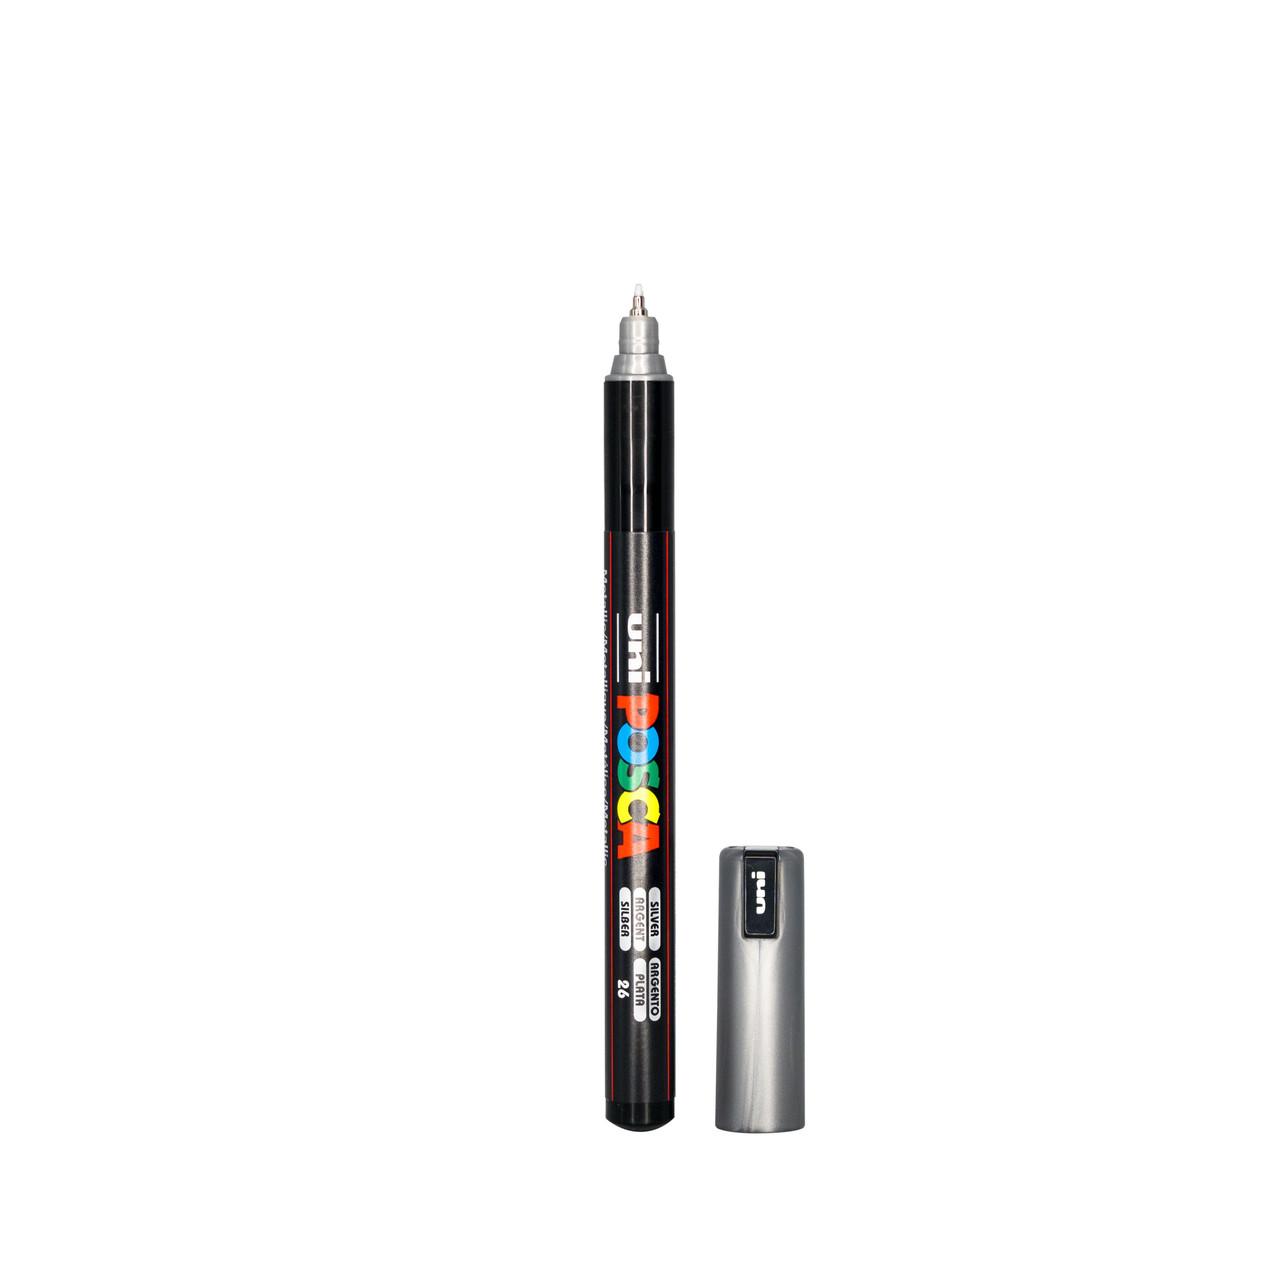 Uni Posca Paint Pen Silver Metallic Pc.5m X 1 Marker Free Postage Silver